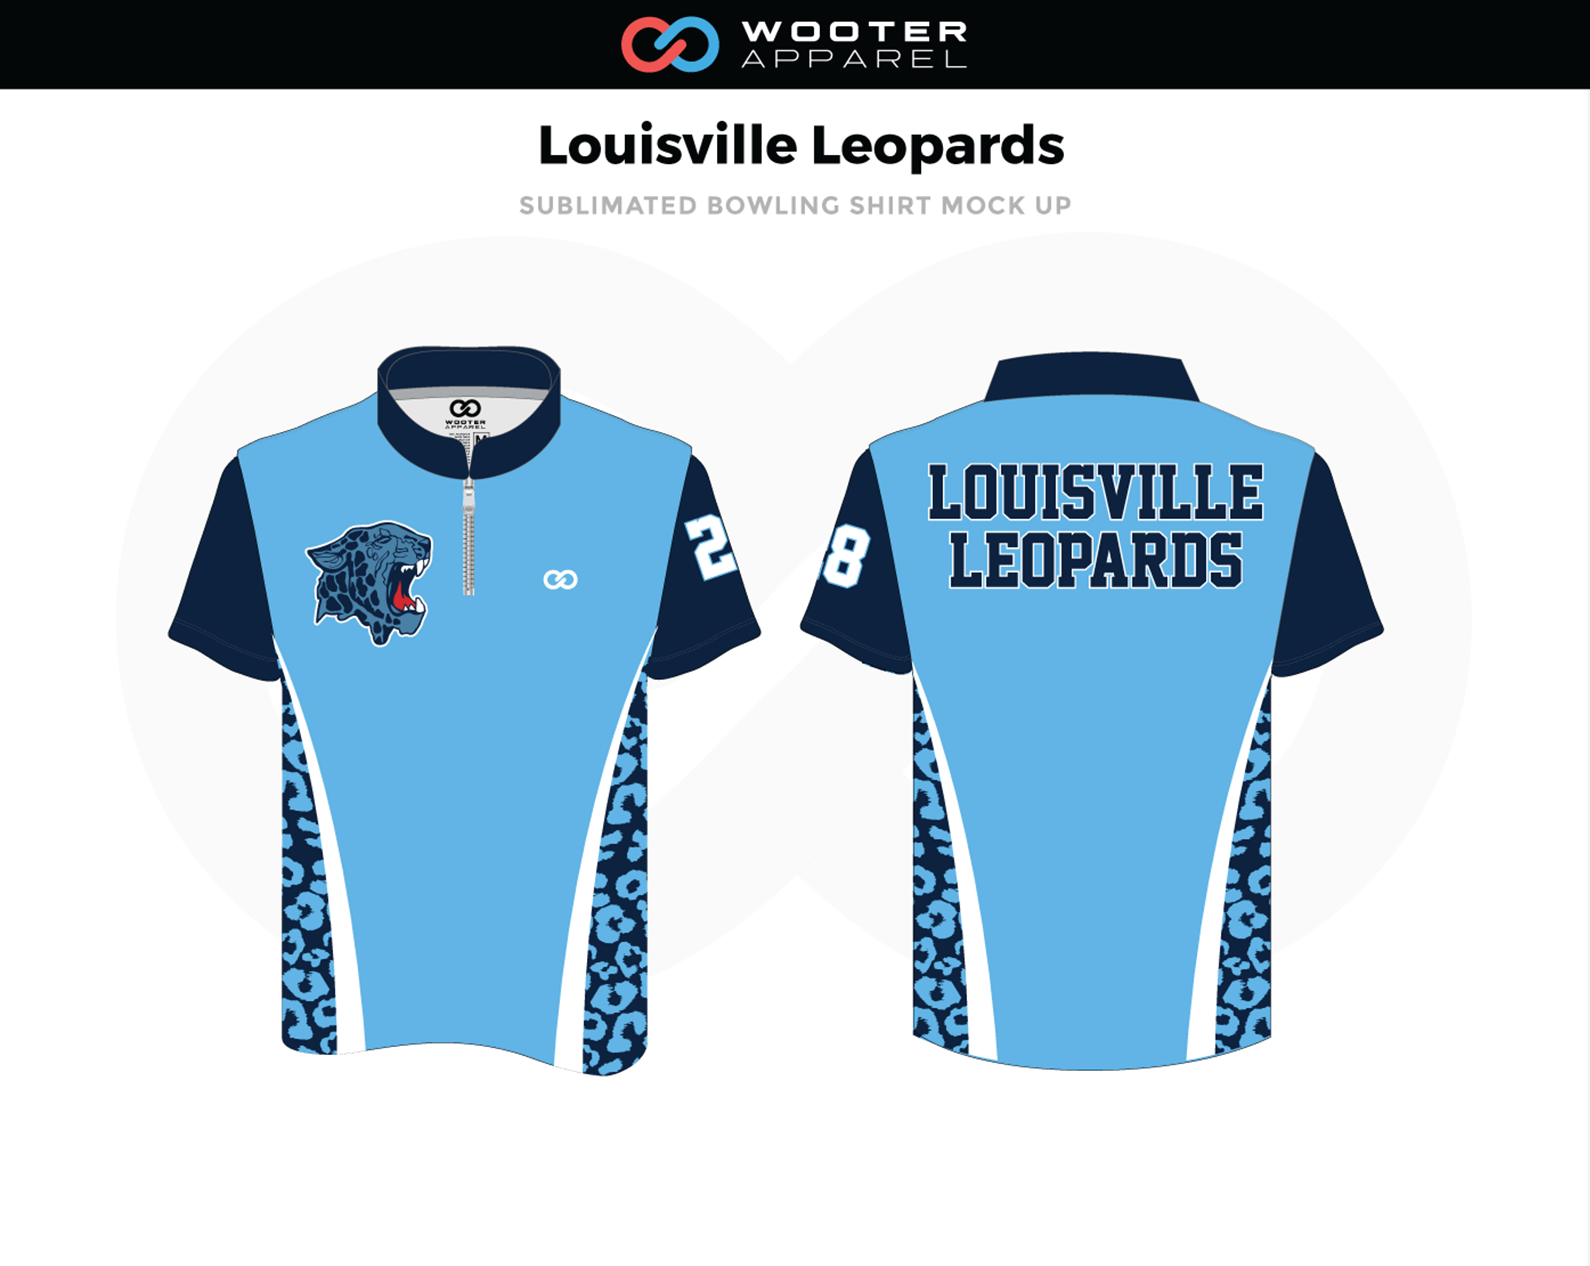 Louisville-Leopards-Bowling-Sublimated-Bowling-Shirt-Mock-Up_v1_2018.png